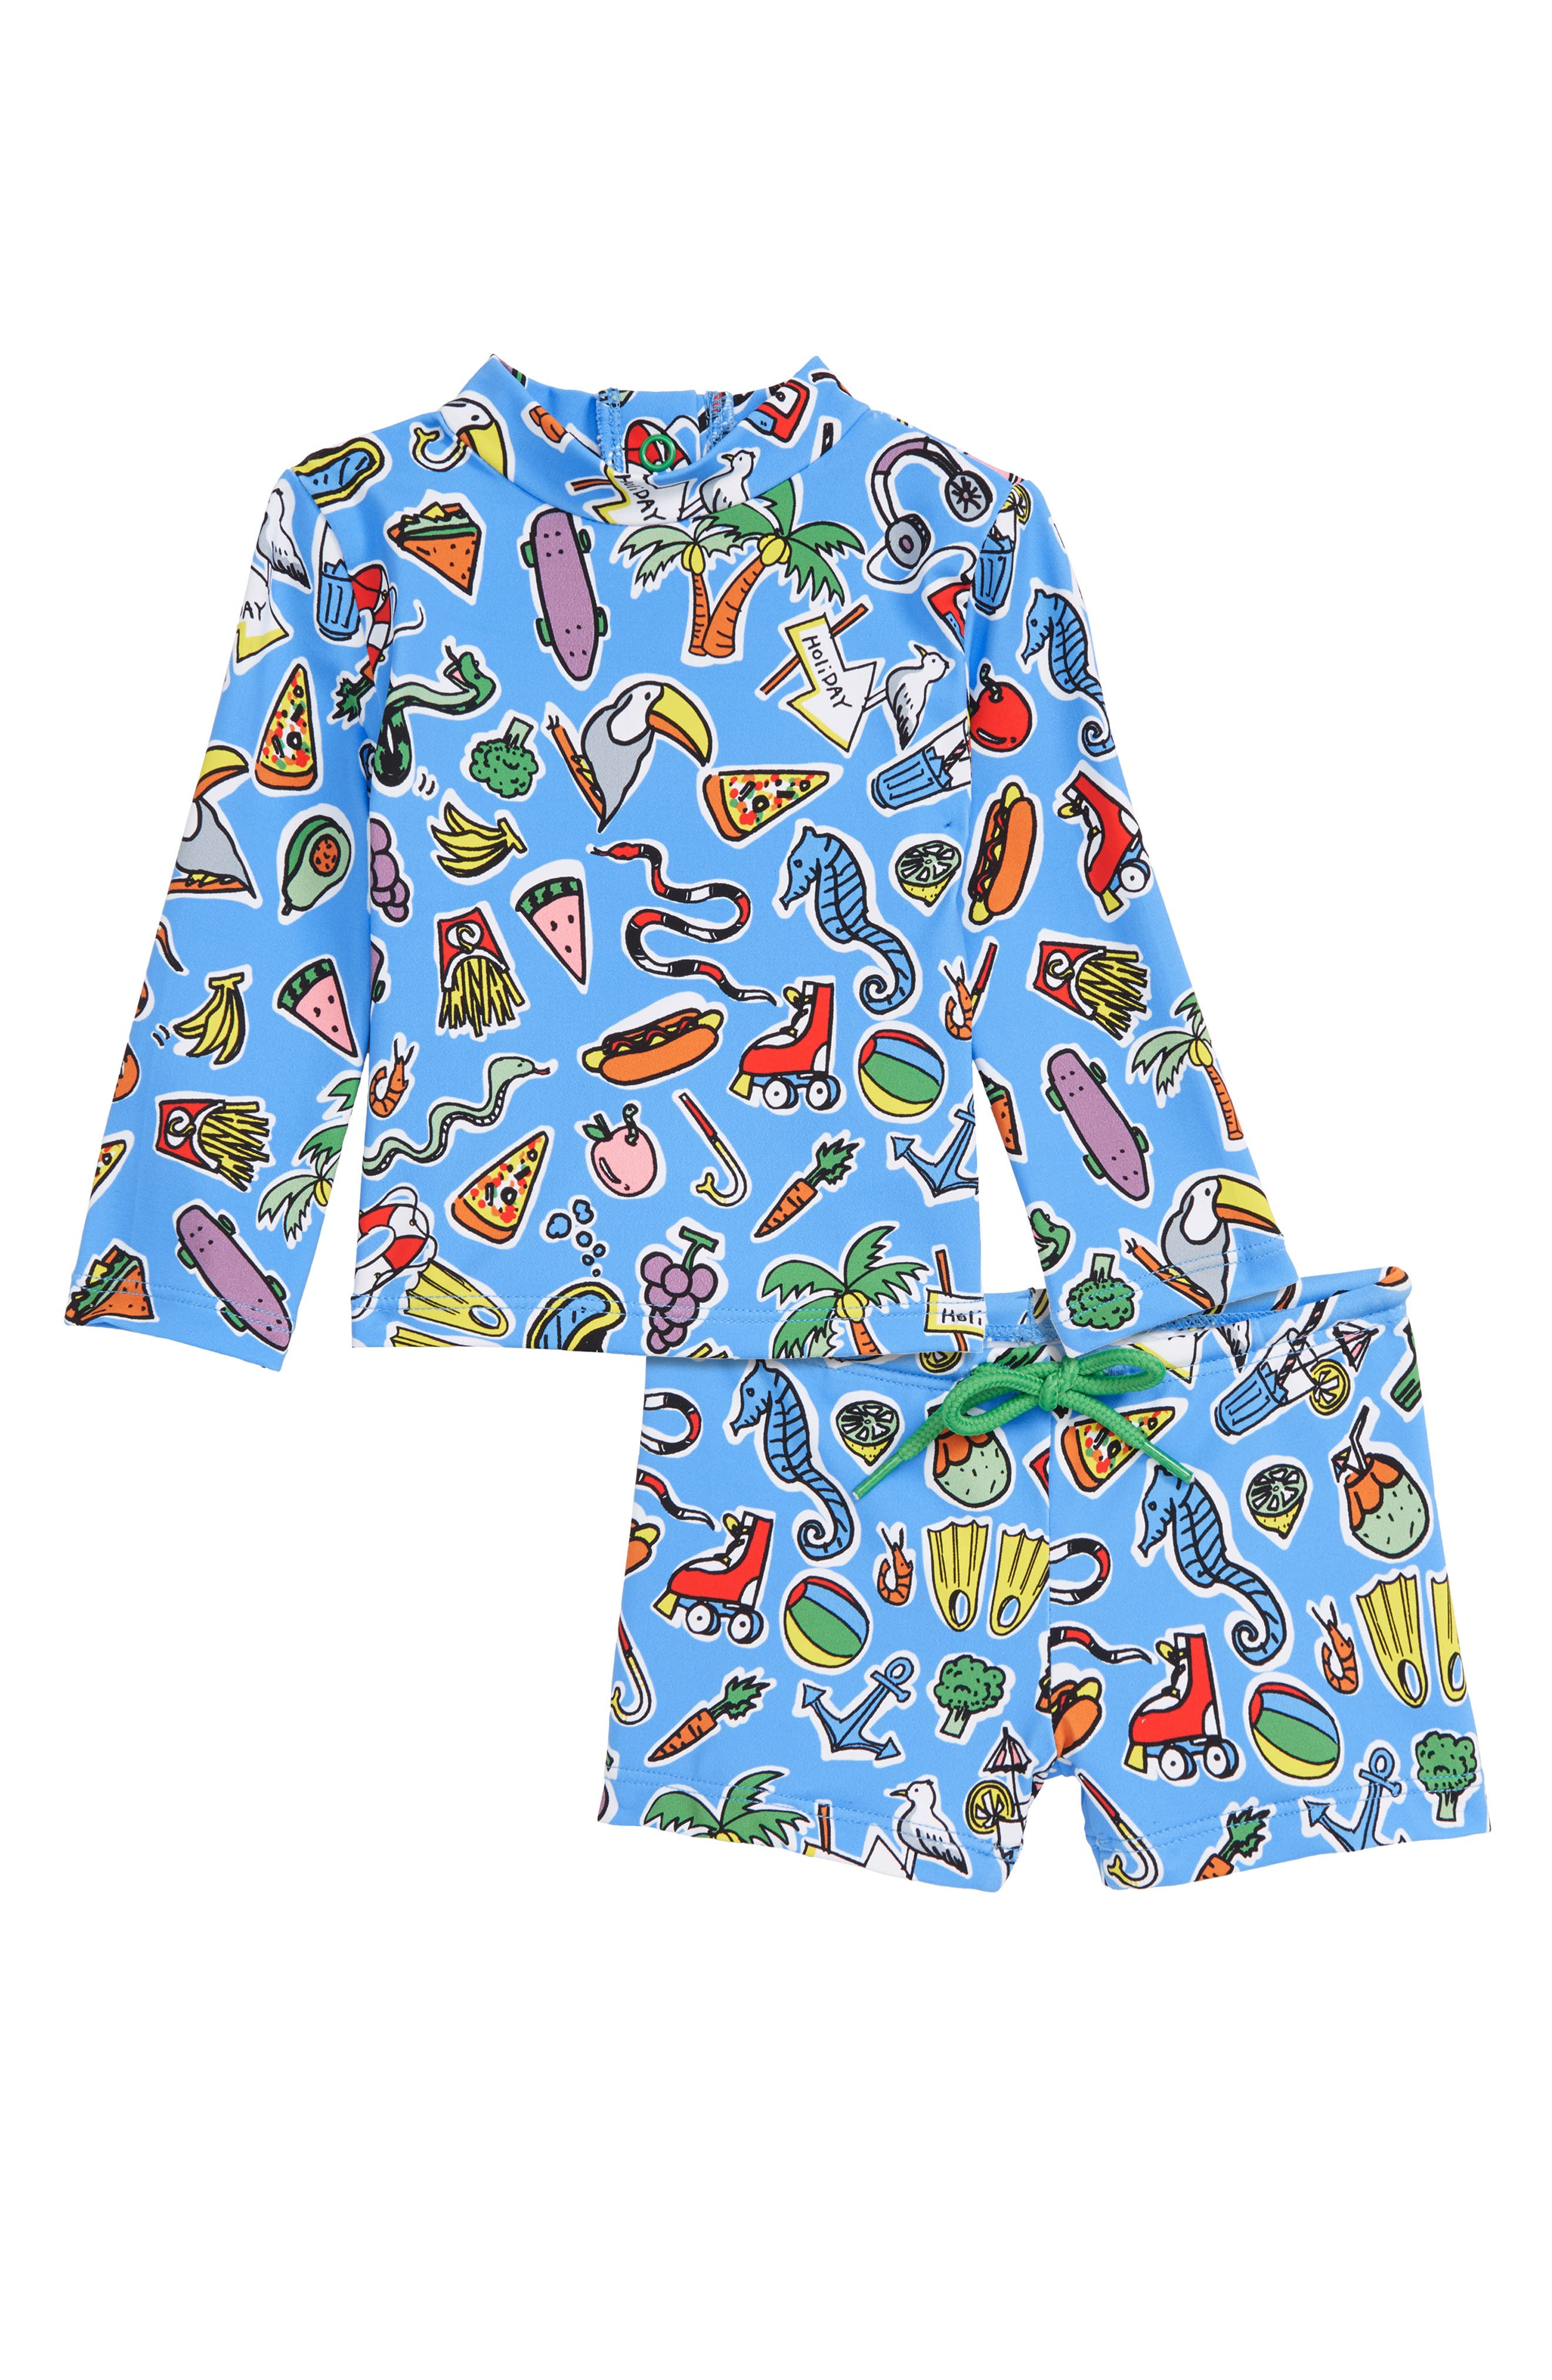 Stella McCartney Print Two-Piece Rashguard Swimsuit,                             Main thumbnail 1, color,                             BLUE